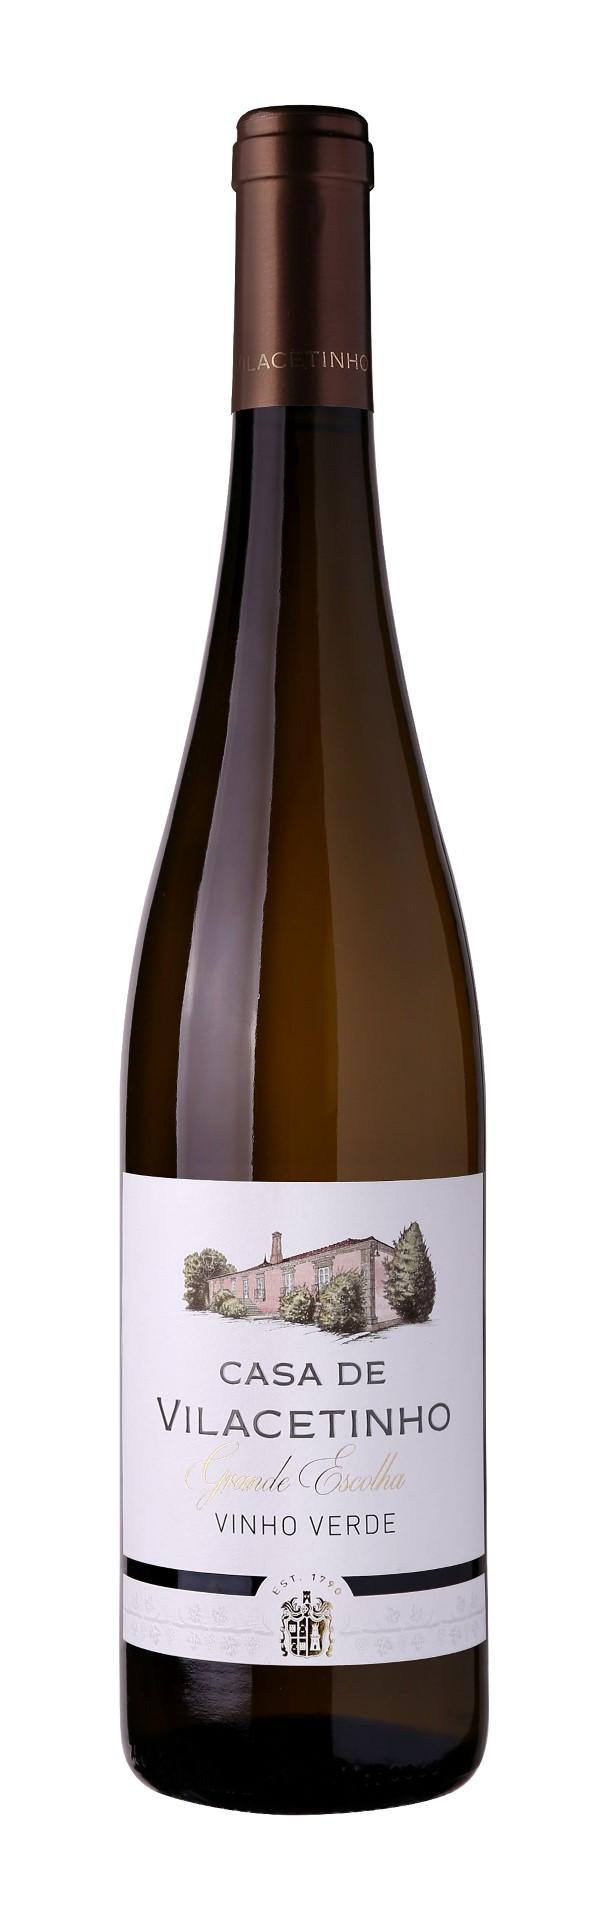 2015Vilacetinho Vinho Verde